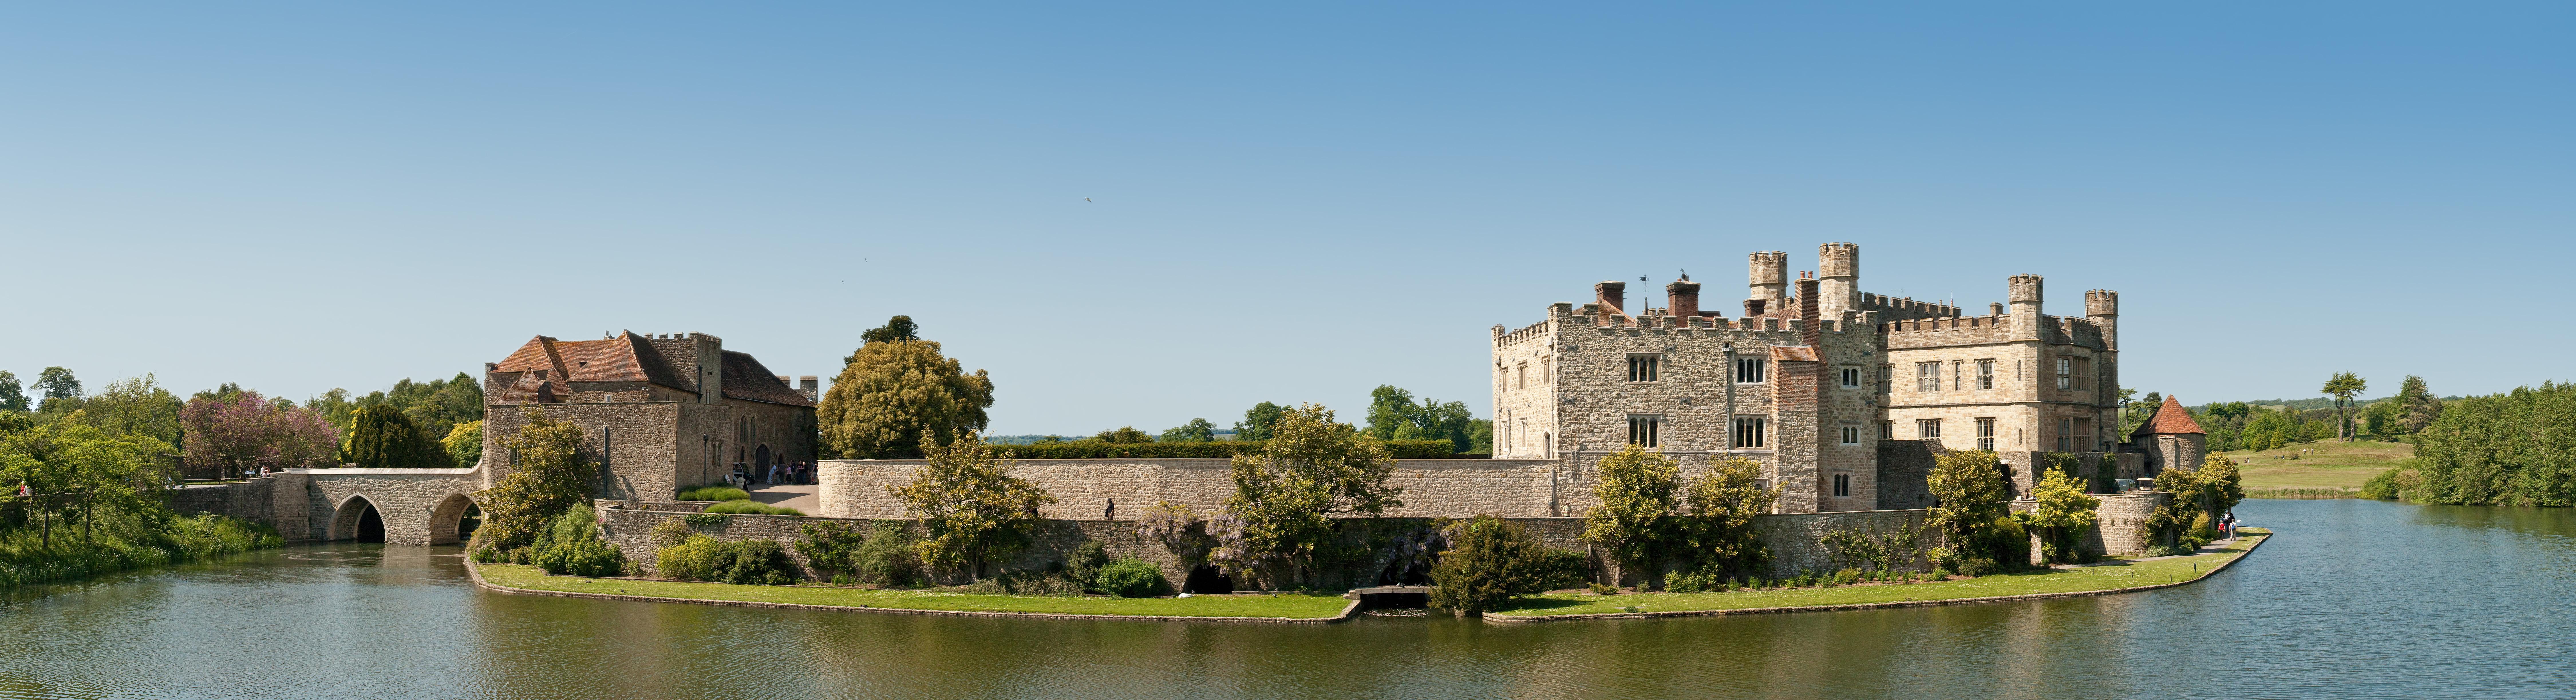 Description leeds castle kent england 3 may 09